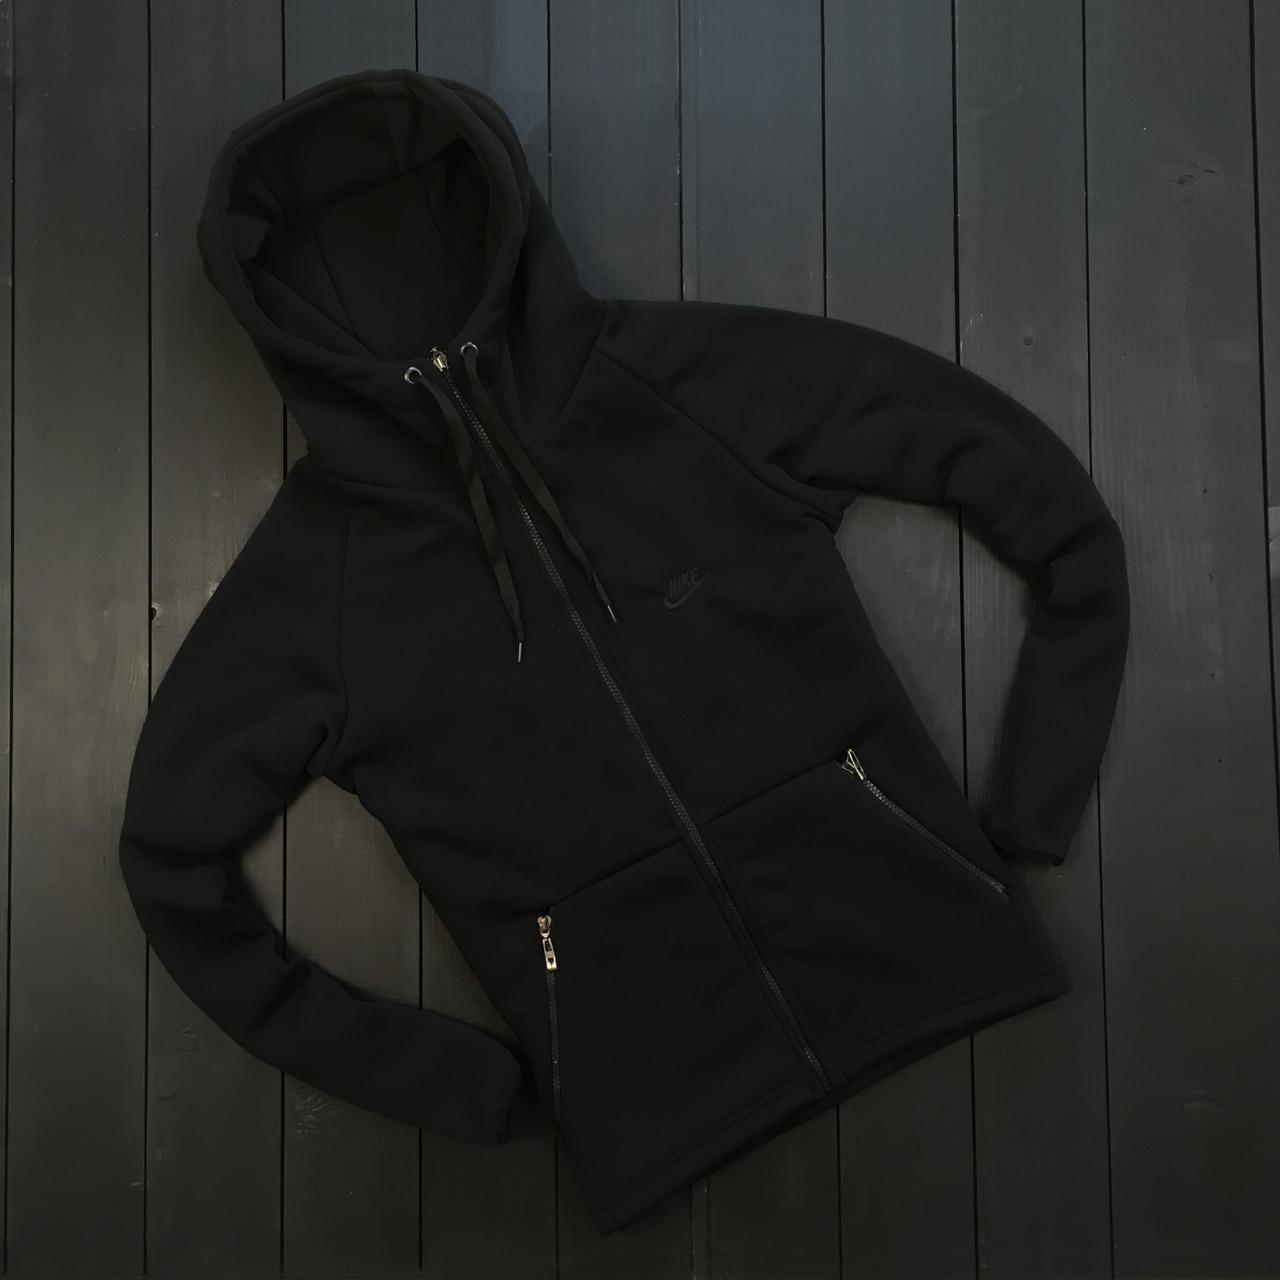 Мужское зимнее худи Nike black (Реплика ААА)